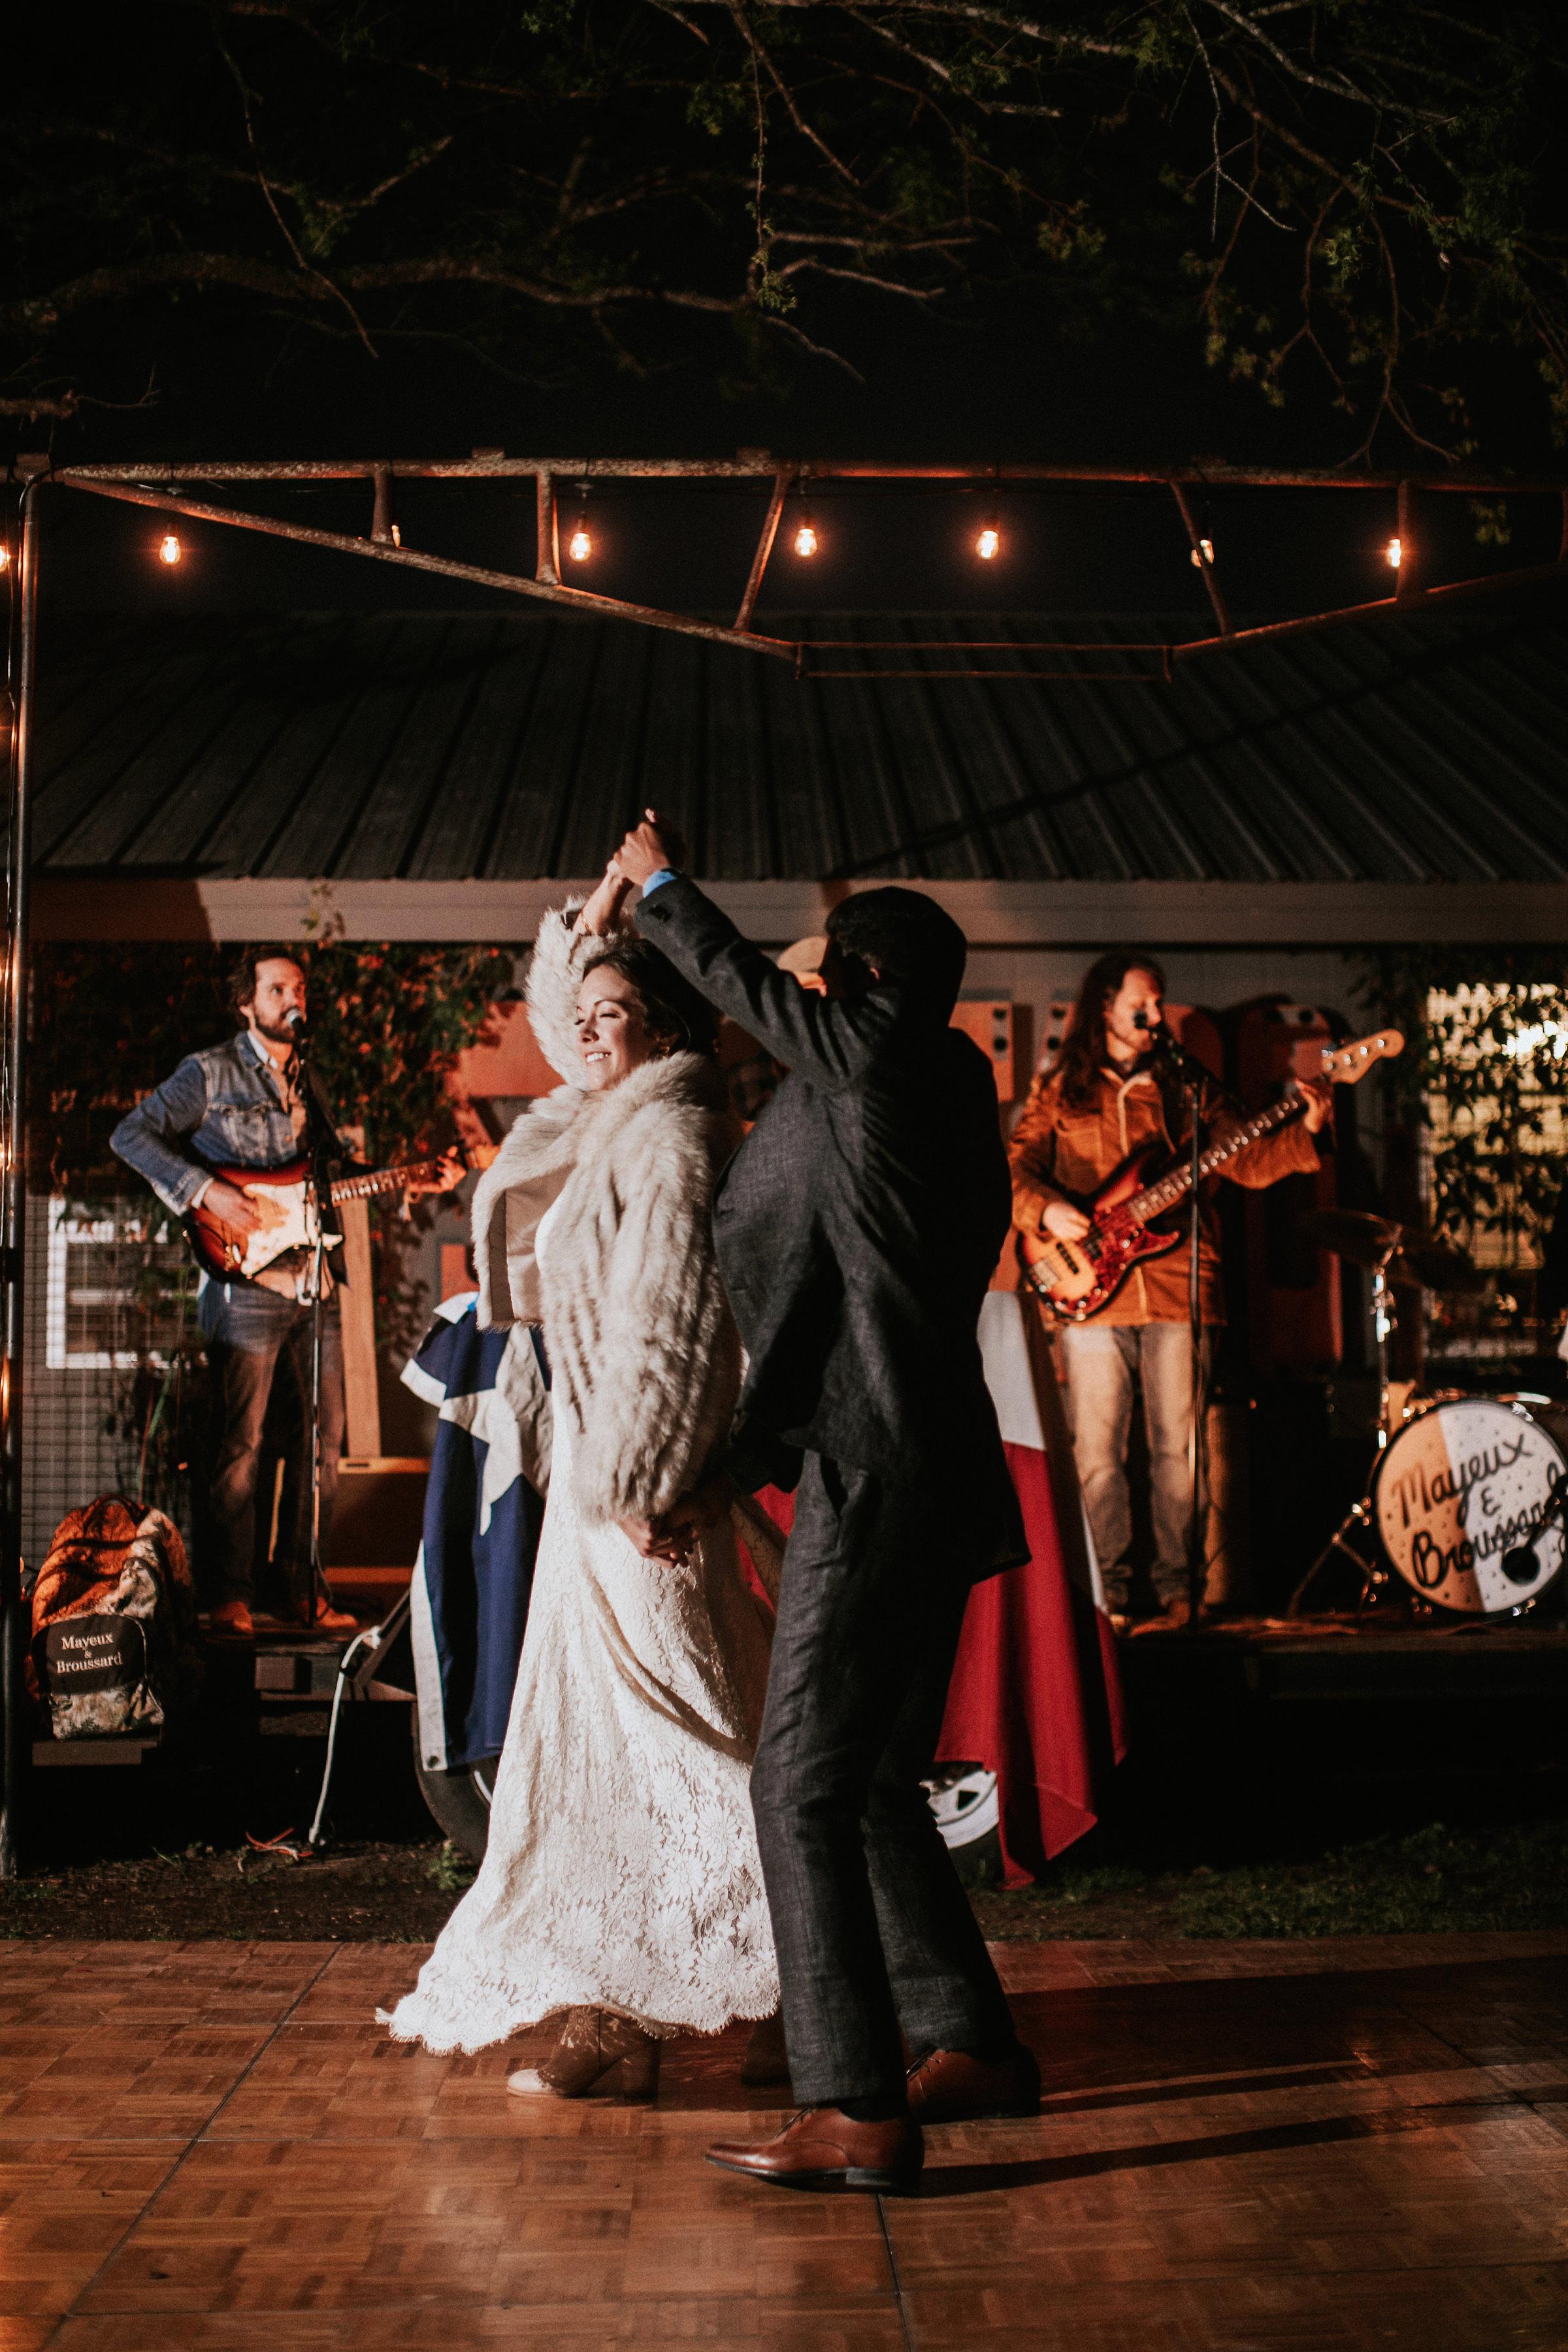 shannon jason wedding first dance couple